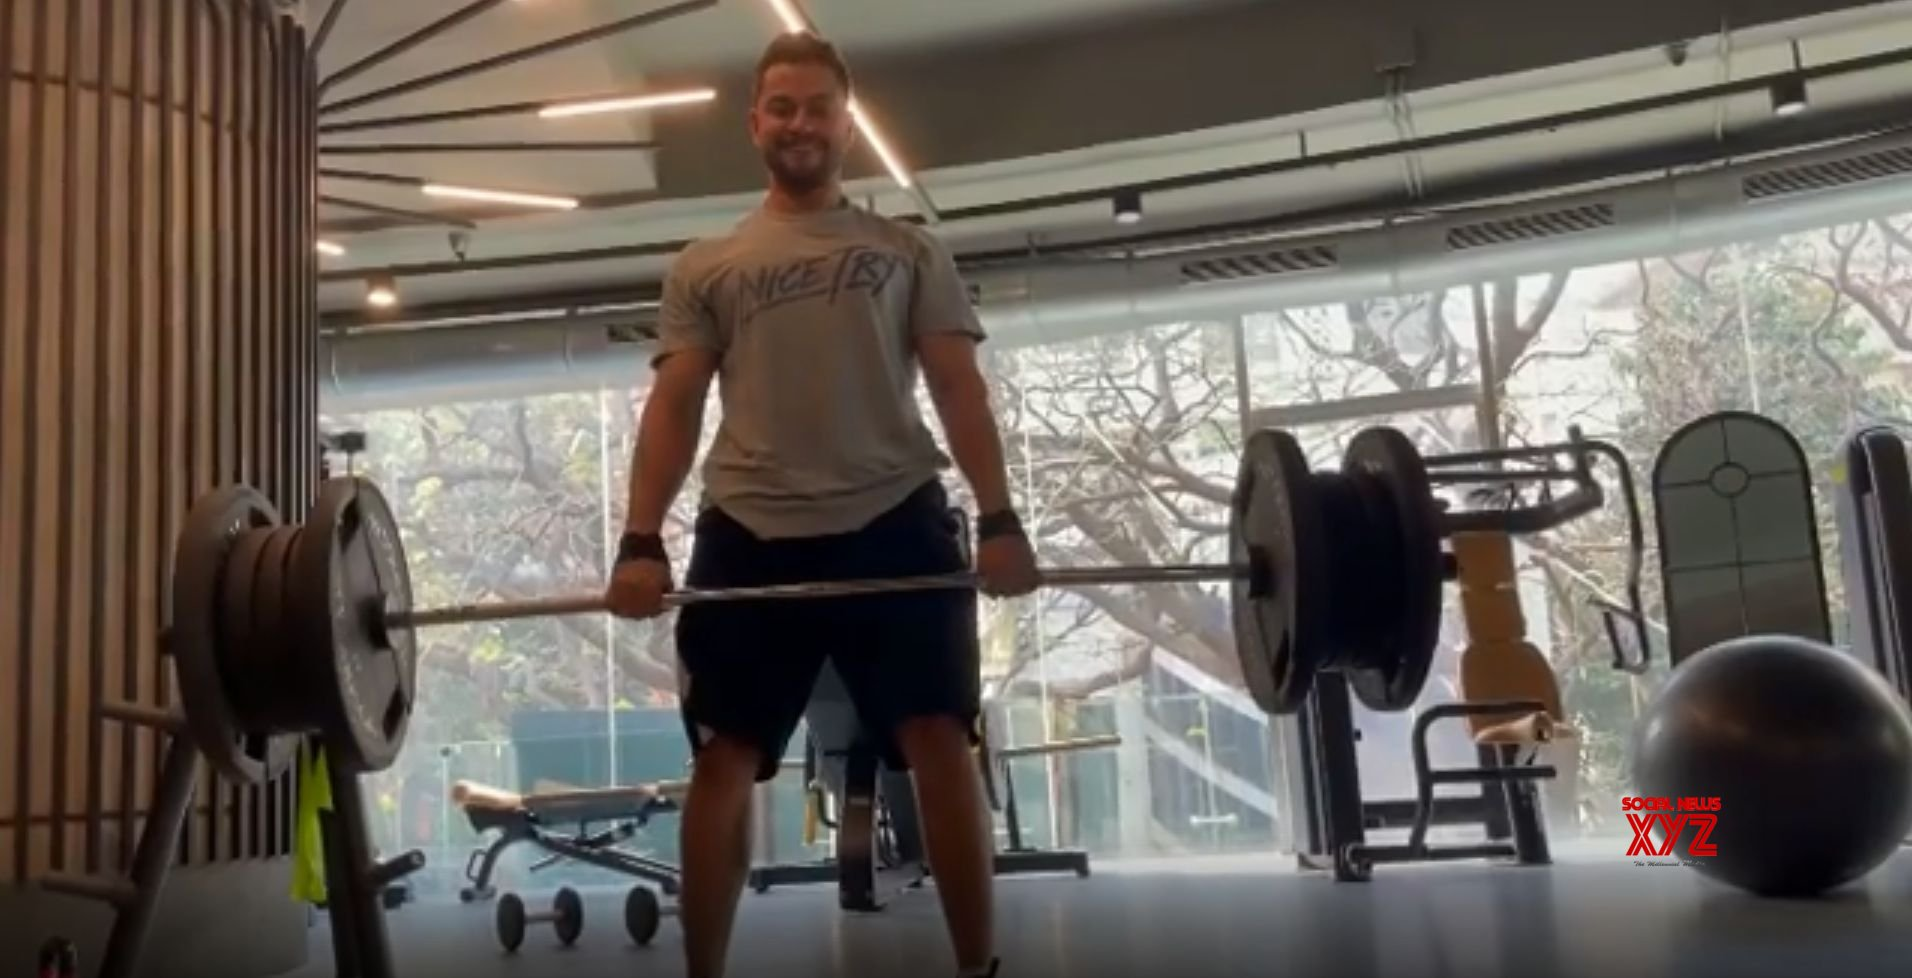 Kunal Kemmu deadlifts 150 kilos of weights